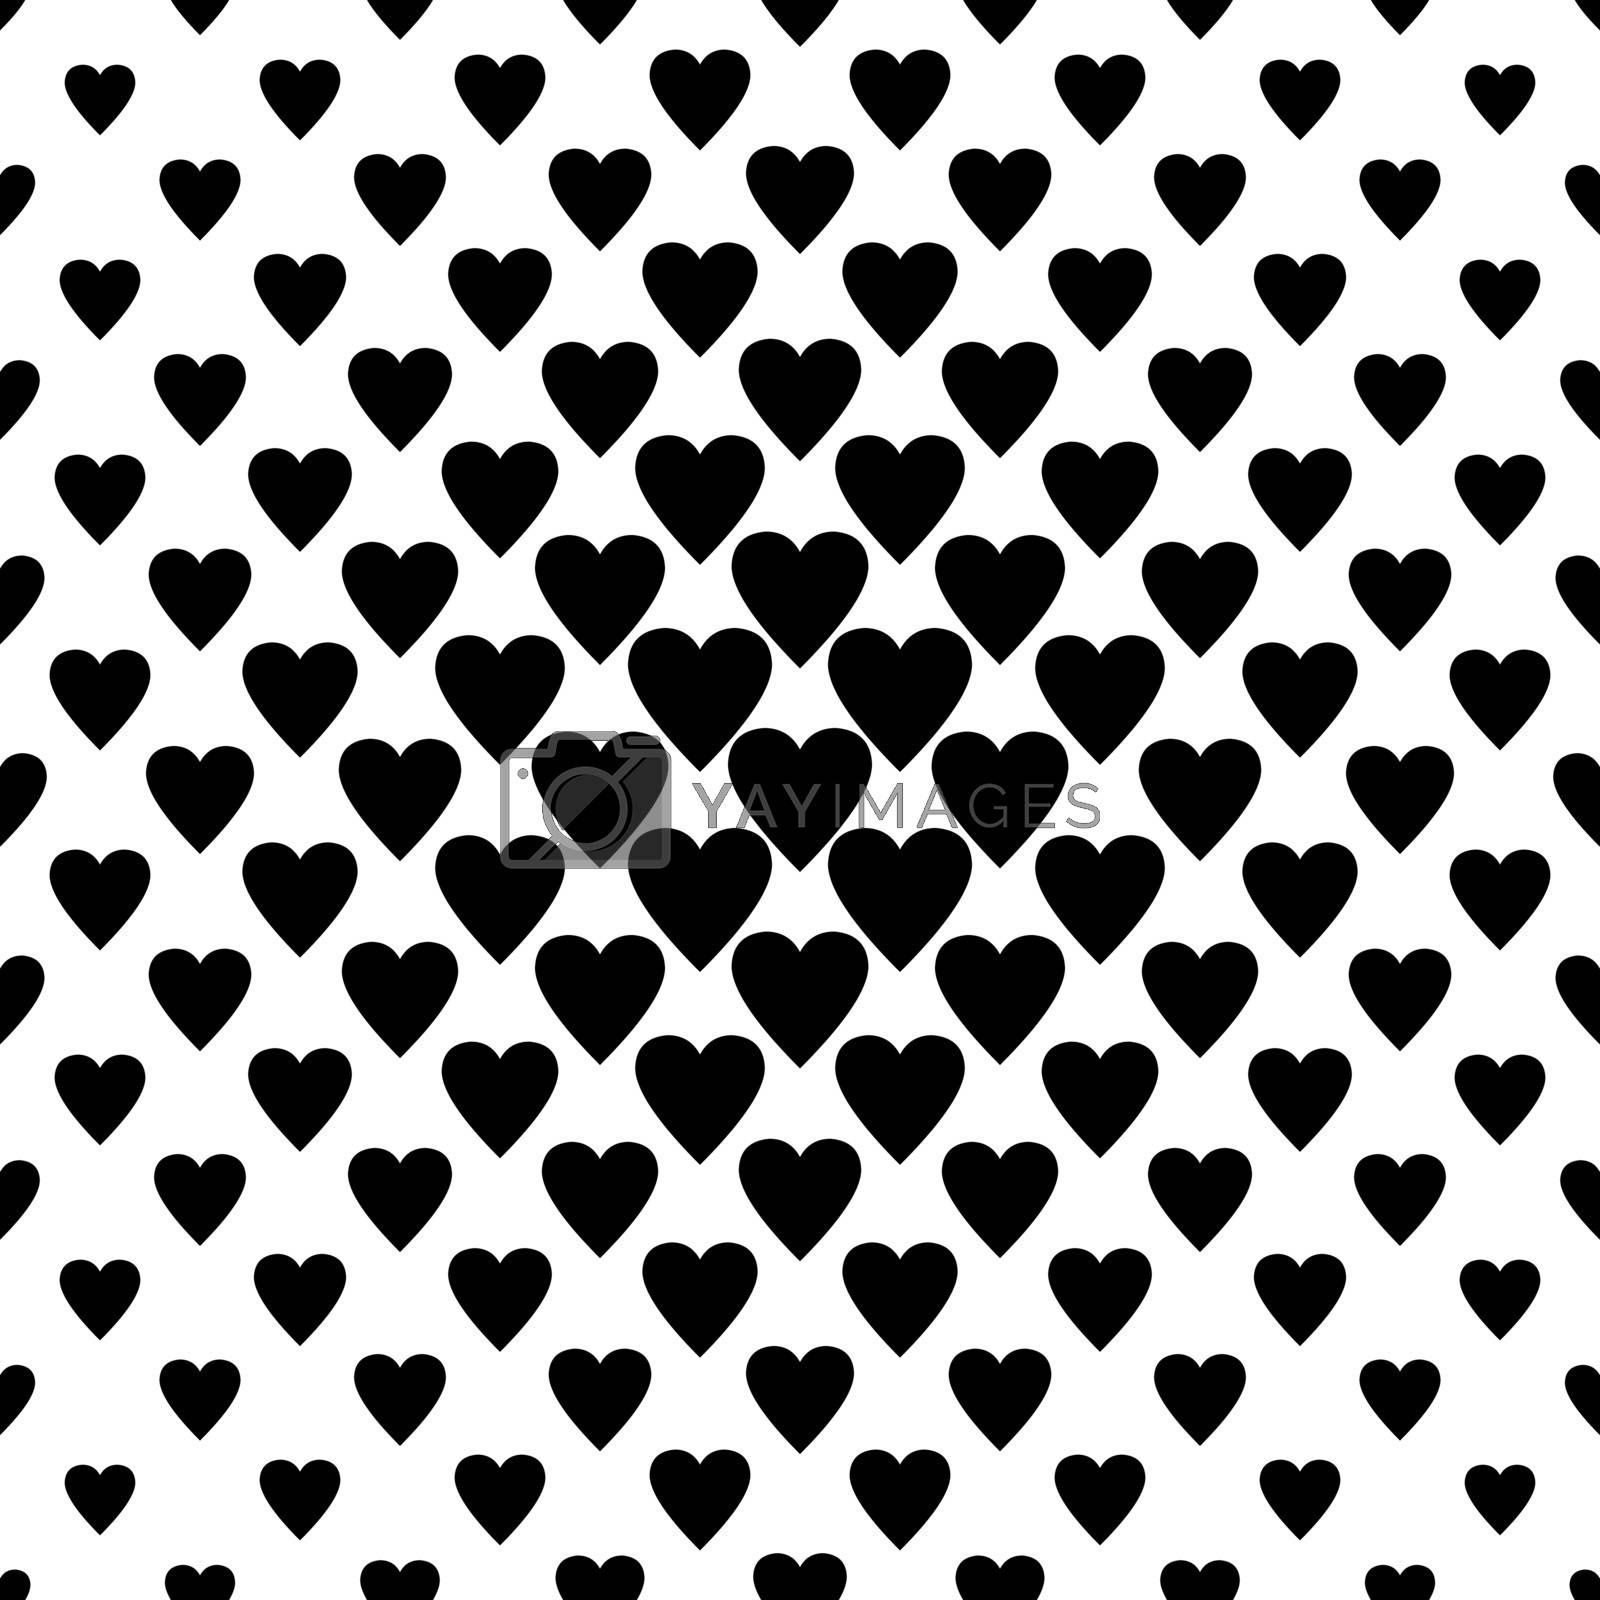 Seamless black heart pattern